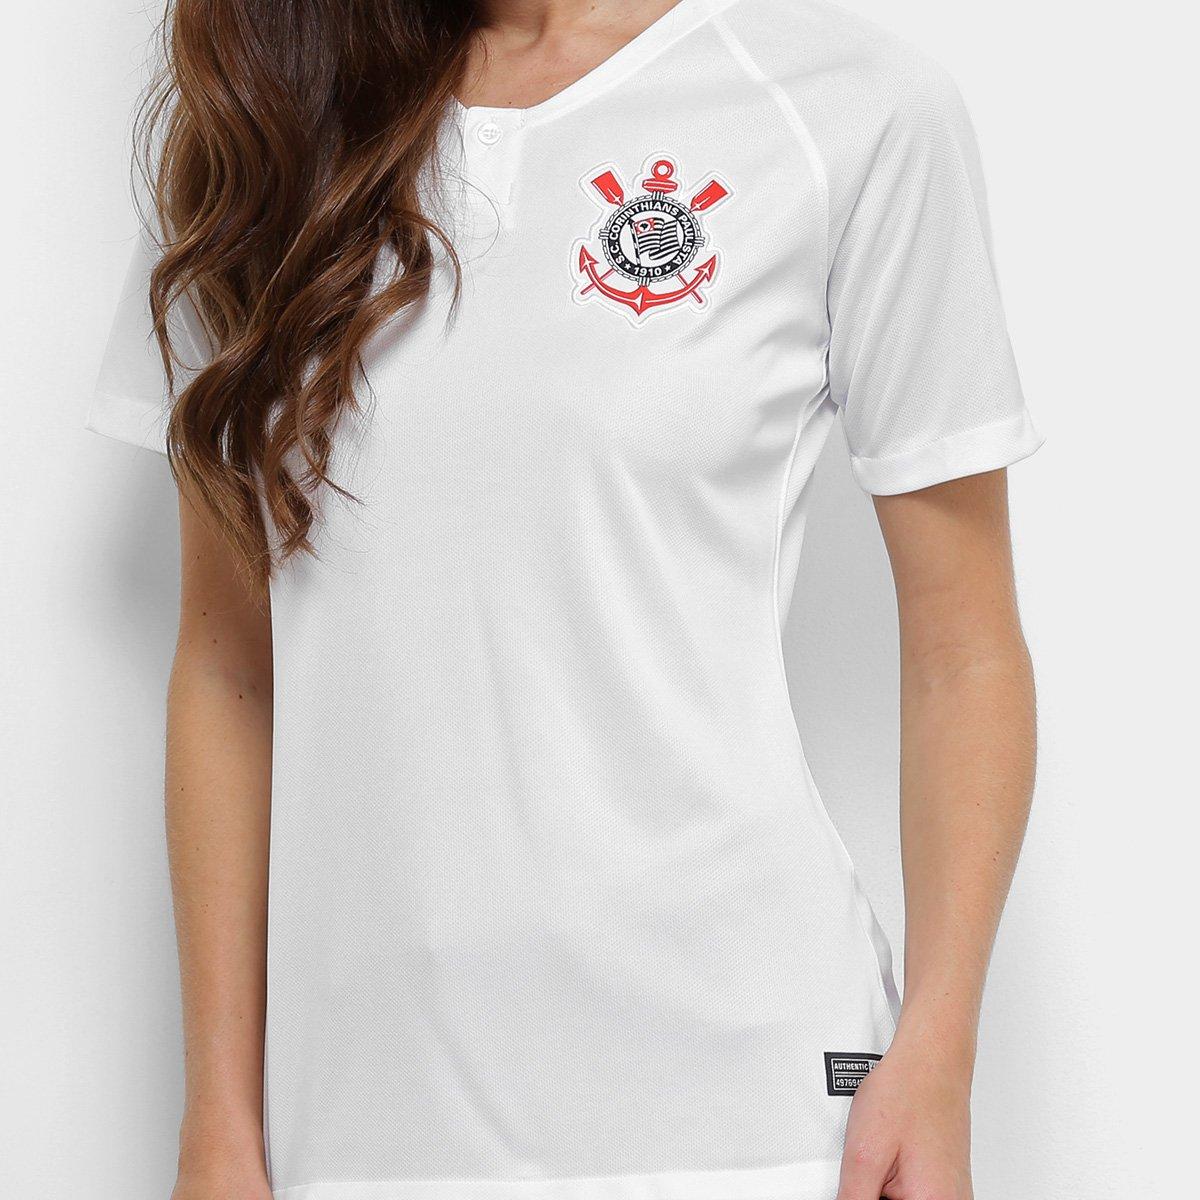 fa51028de1 Camisa Corinthians I 18 19 s n° - Torcedor Nike Feminina - Branco e ...